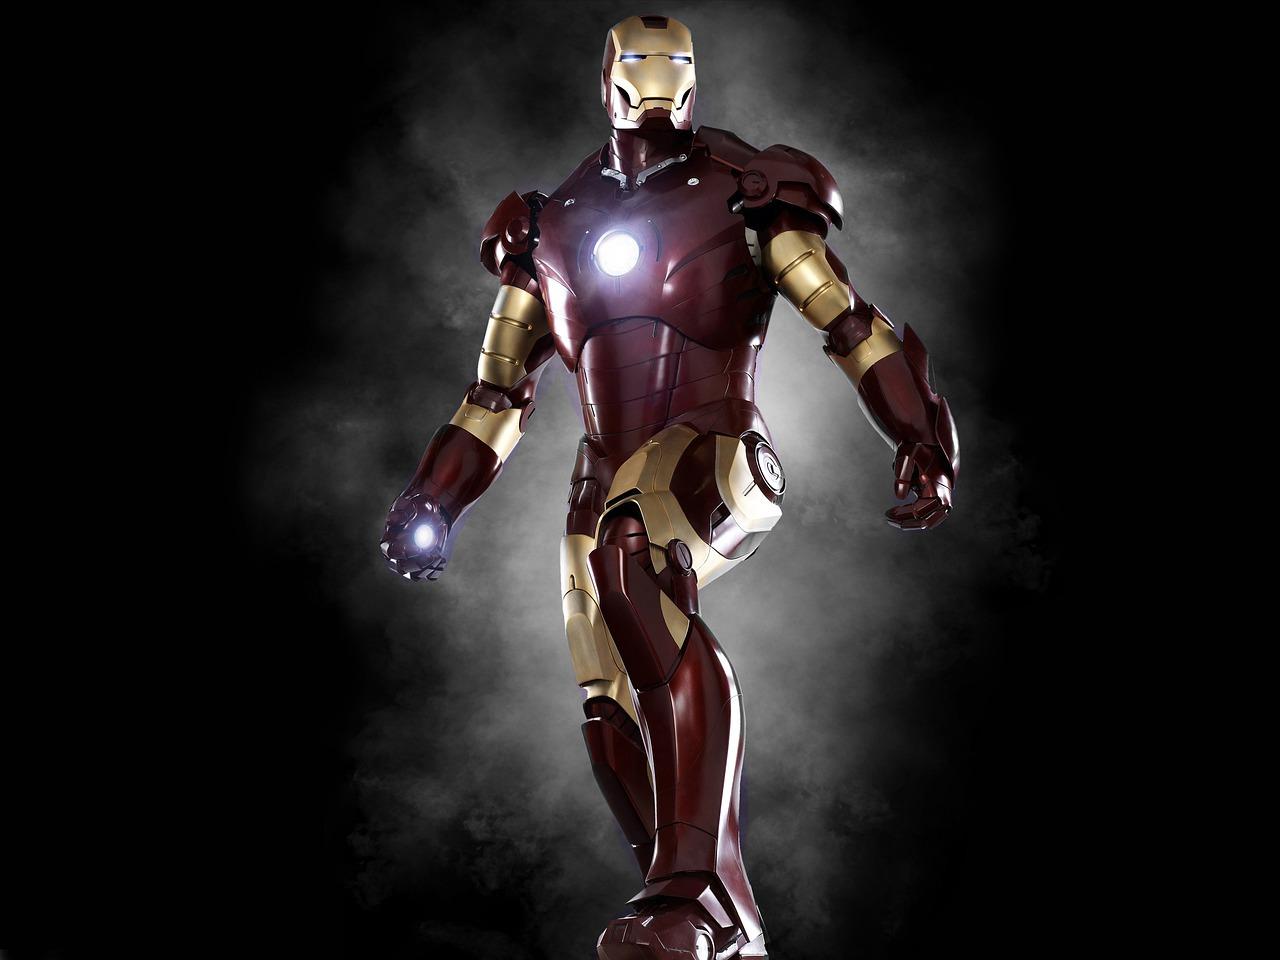 Download Iron Man Game (Free) for Windows PC